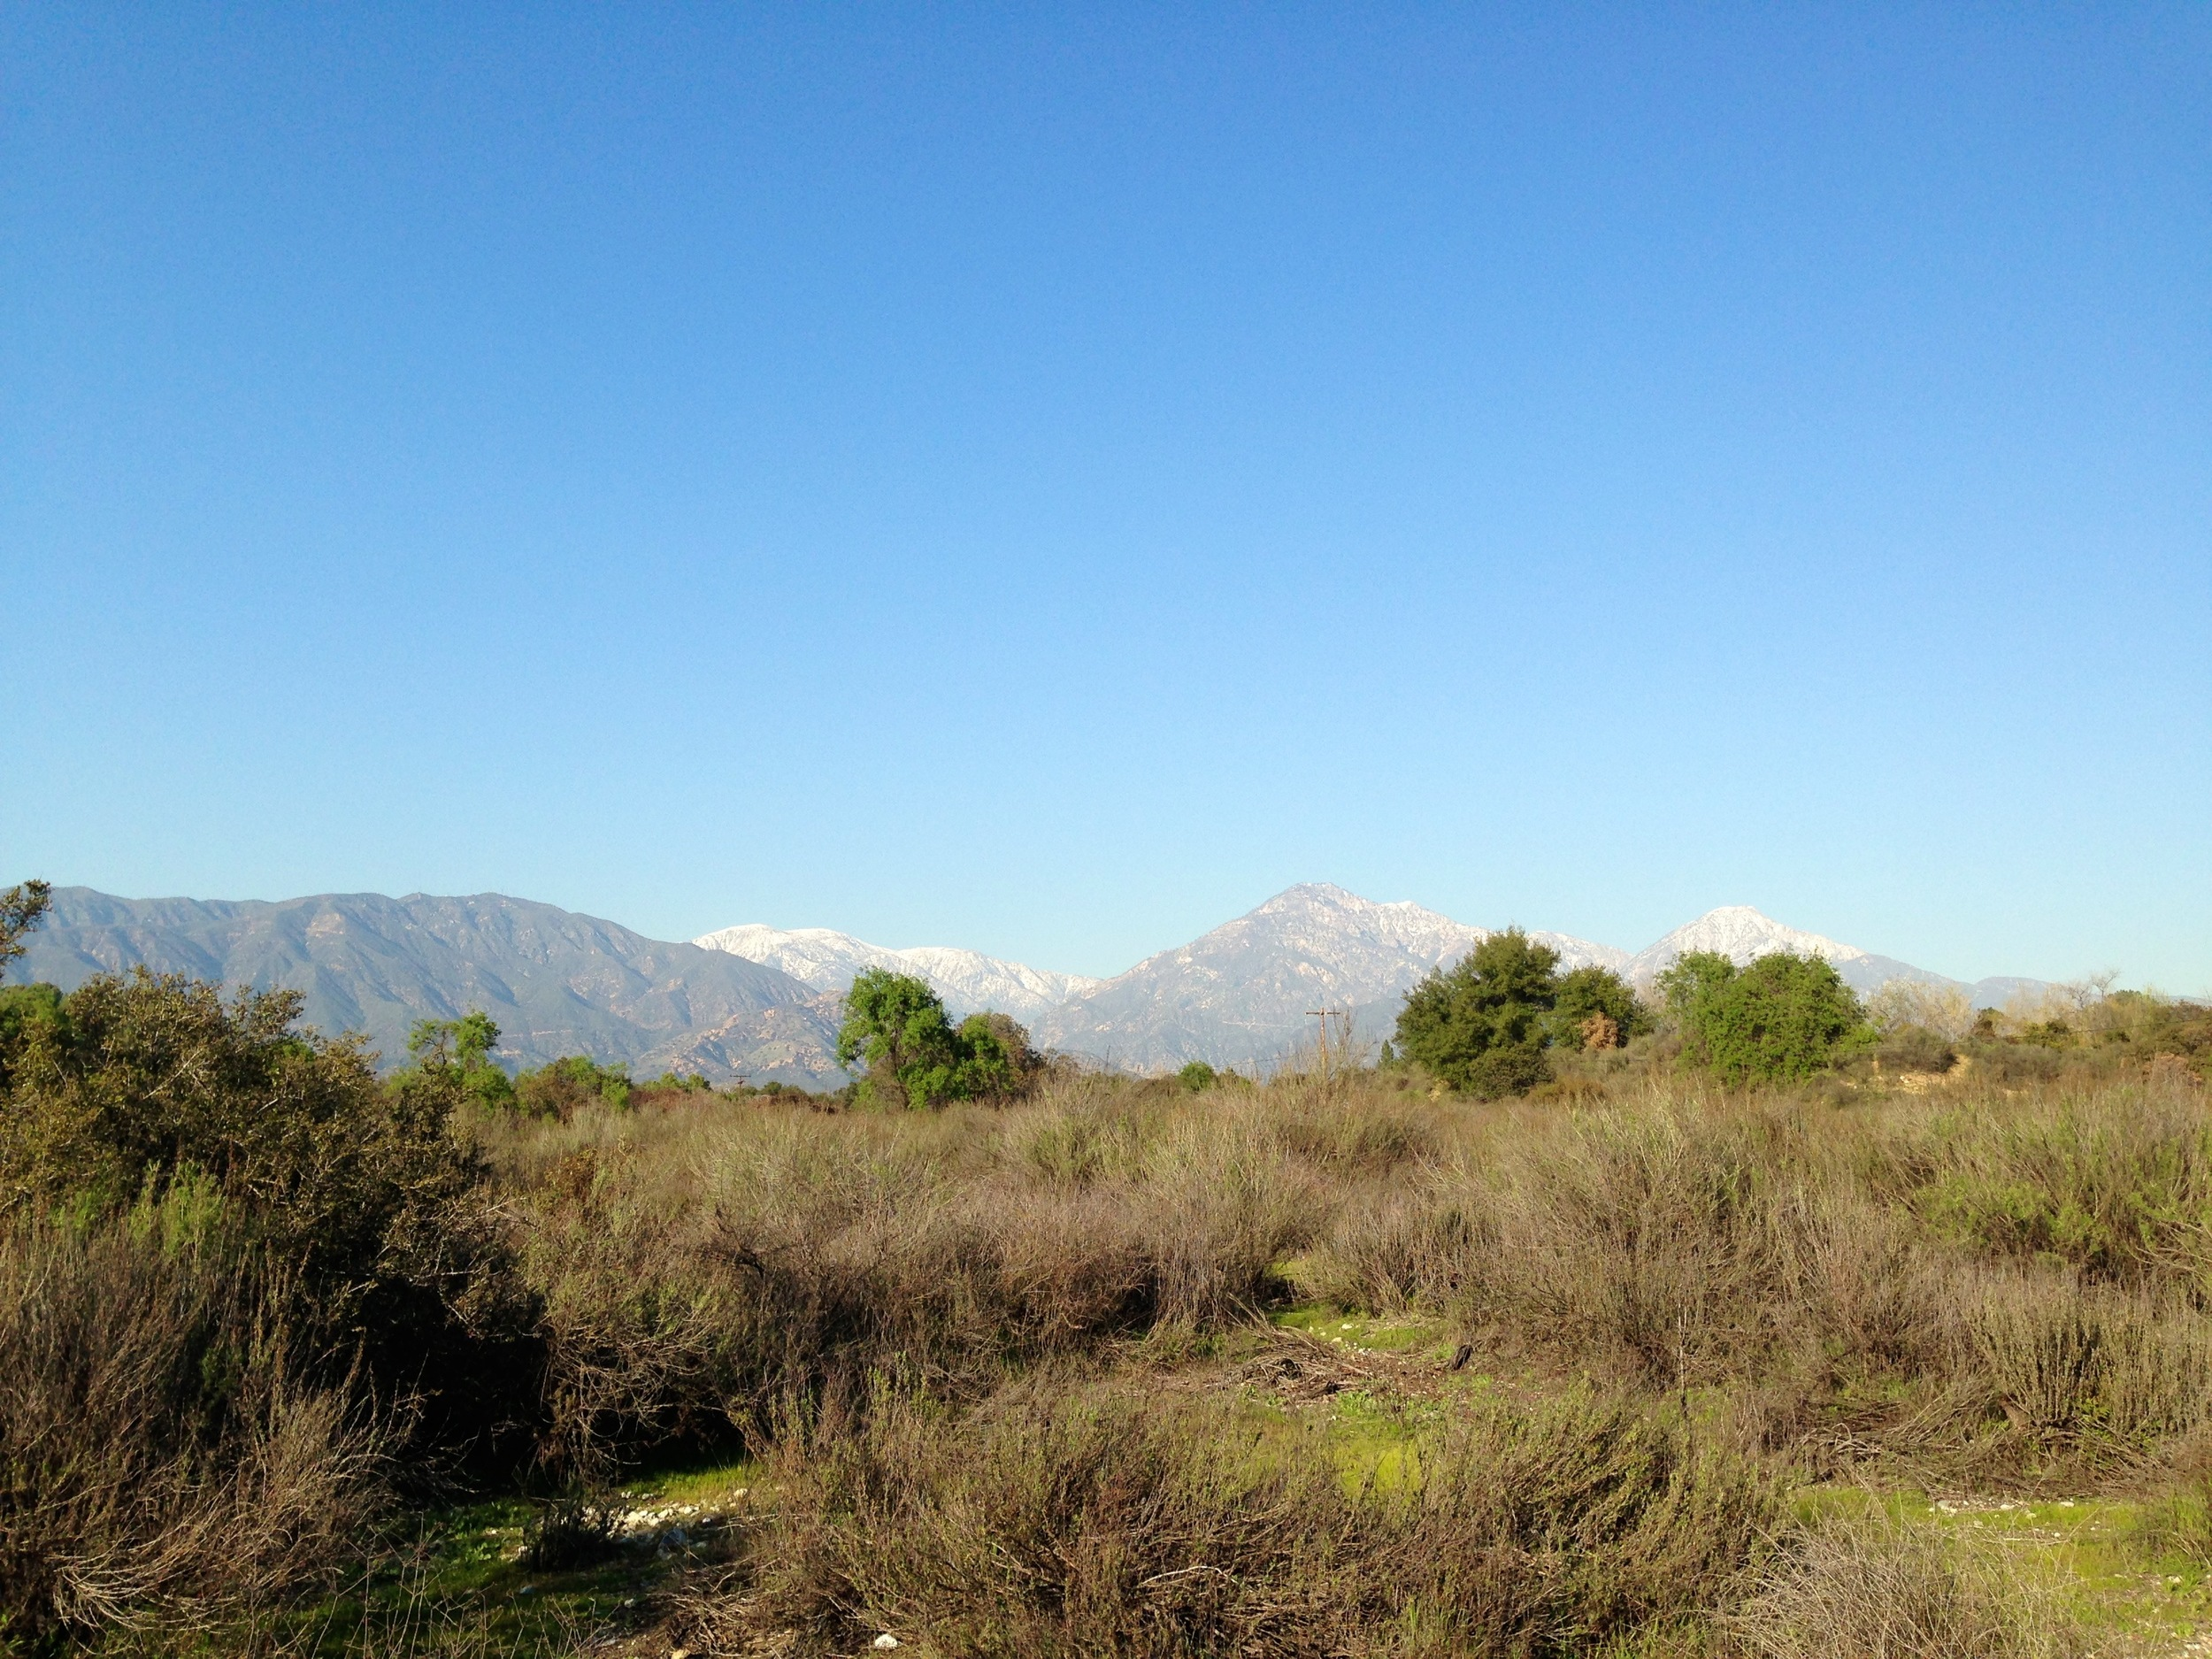 Sage Scrub (dominated by  Artemisia californicus )at the Robert J. Bernard Biological Field Station.